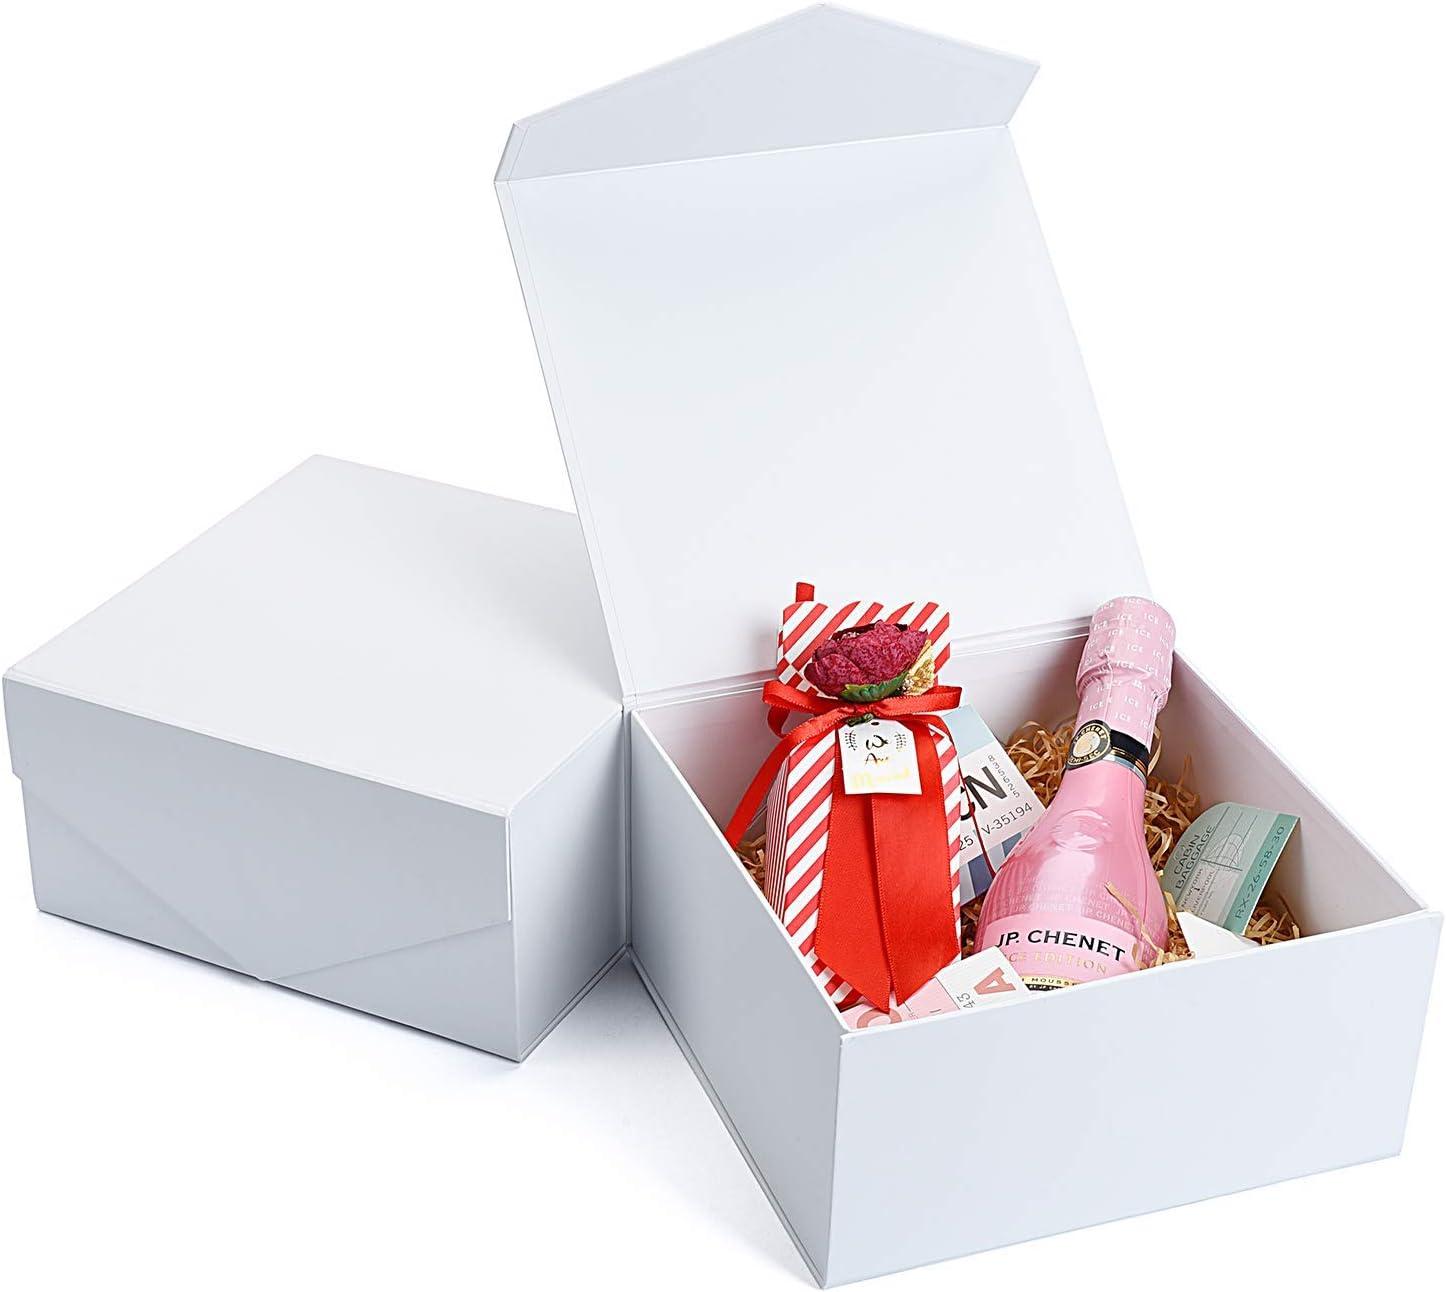 personalized bridesmaid proposal gift box  bridesmaid thank you gift  small white gift box